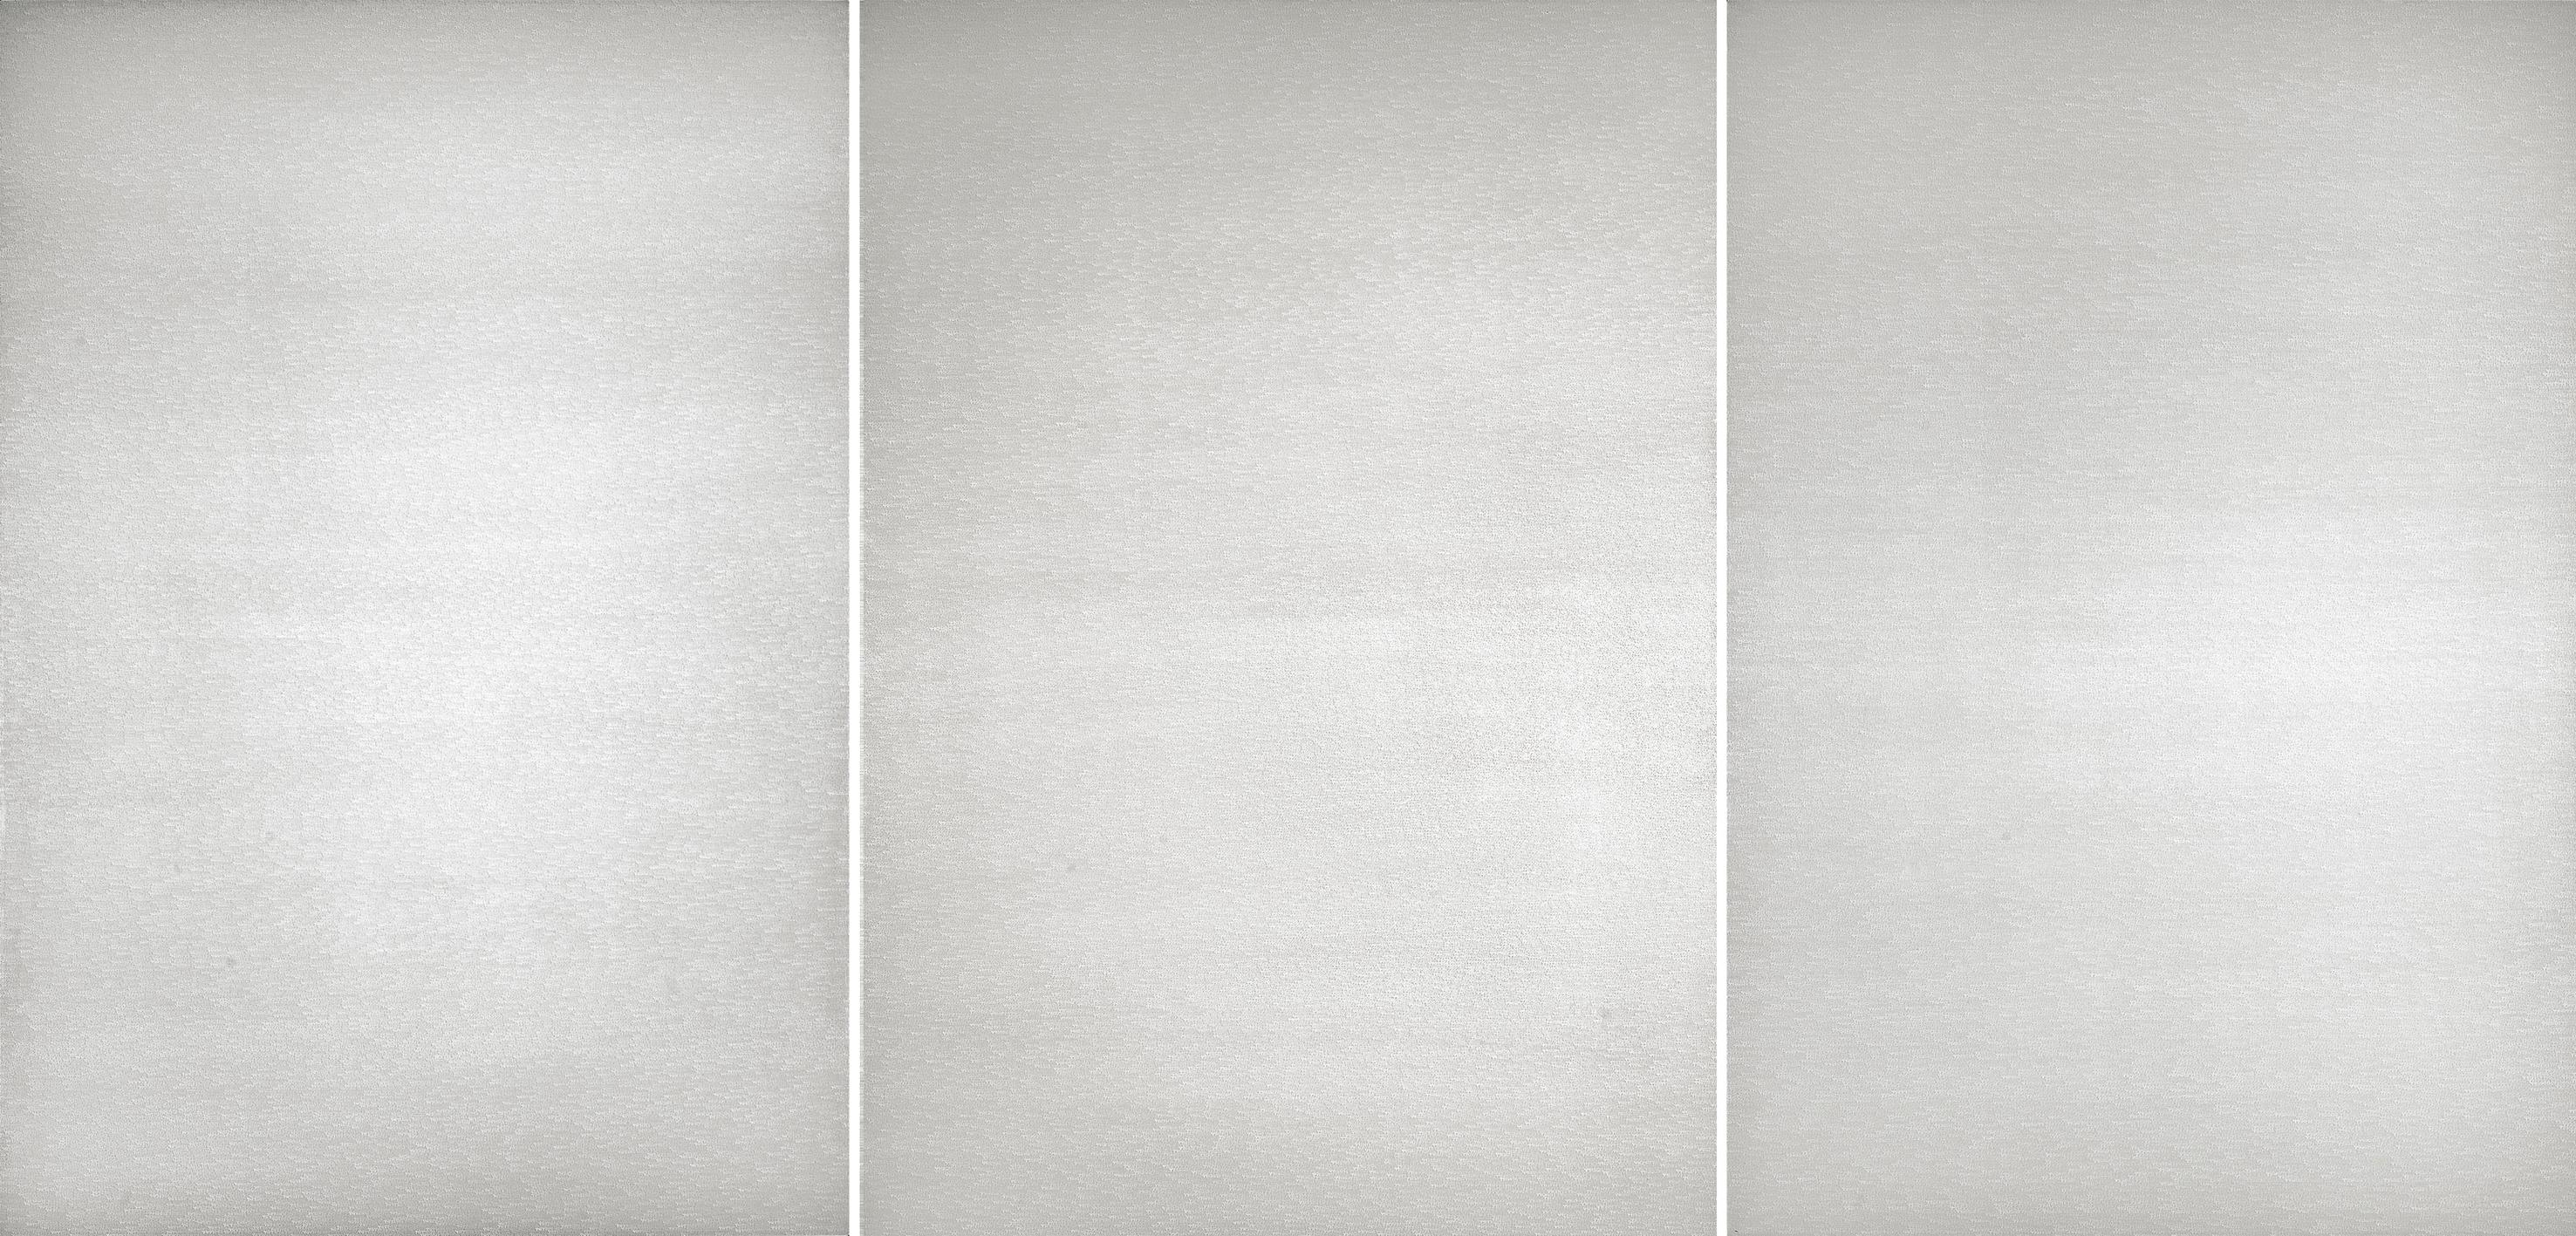 (i) Opalka 1965/1-**** detail-4875812-4894230 (ii) Opalka 1965/1-**** detail-4894231-4914799 (iii) Opalka 1965/1-**** detail-4914800-4932016